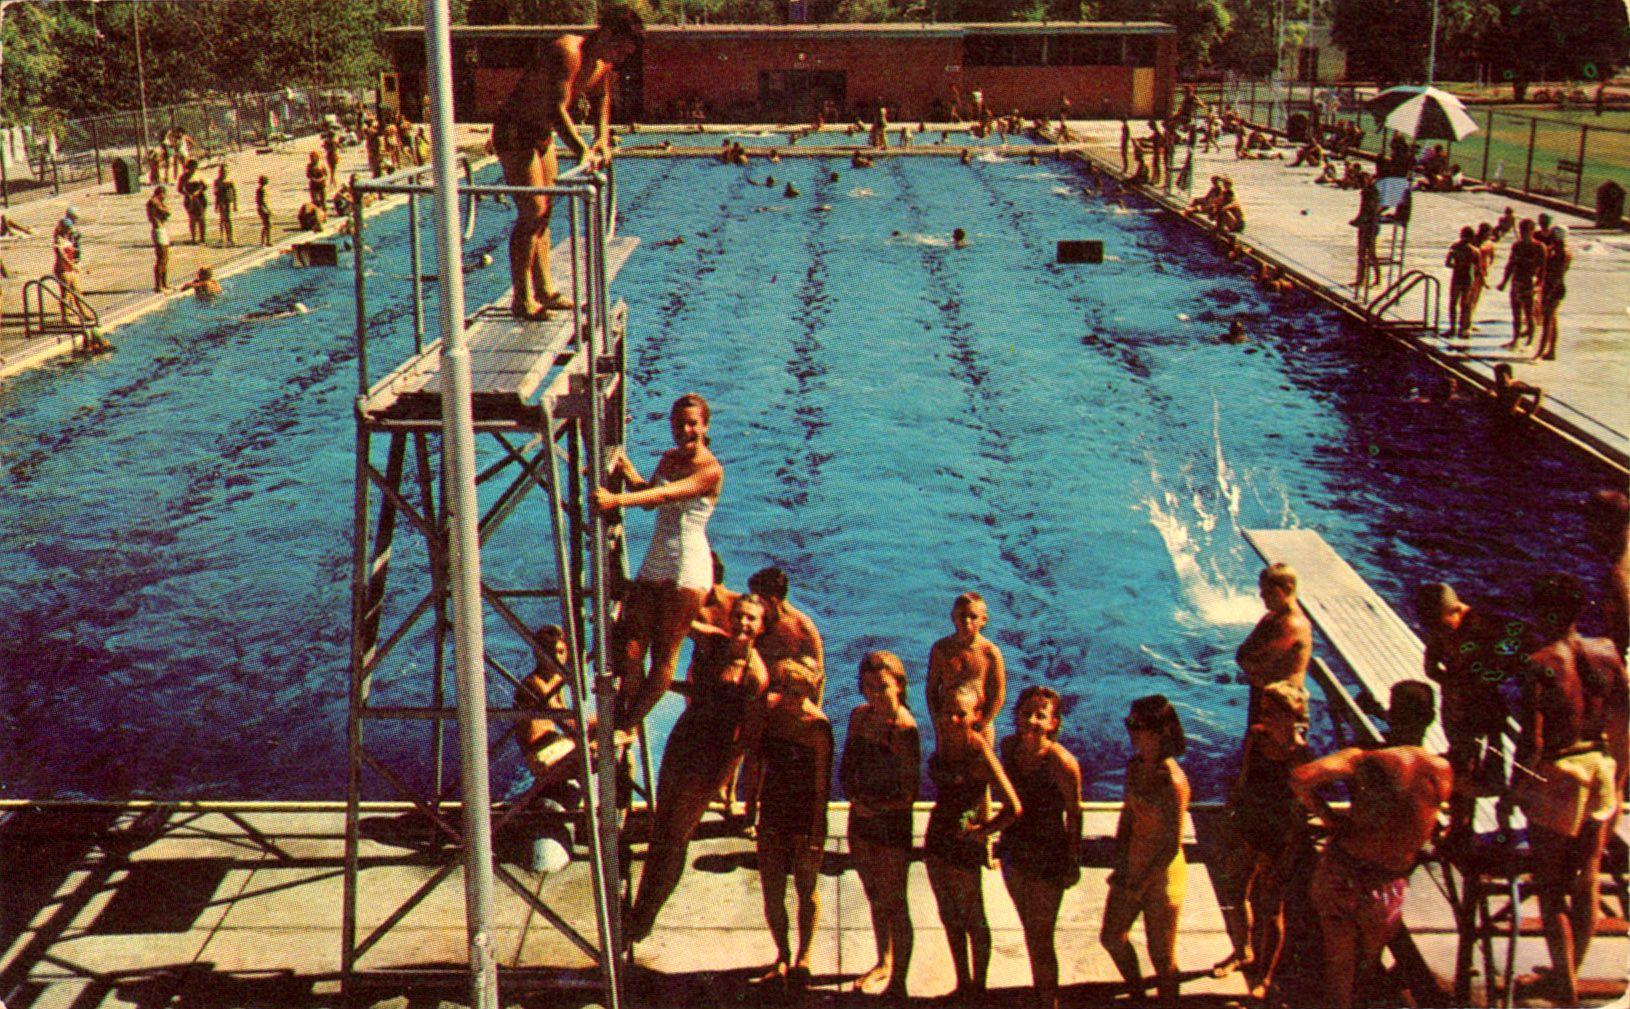 public_swimming_pool_encanto_park_phoenix_az_5401979892_o